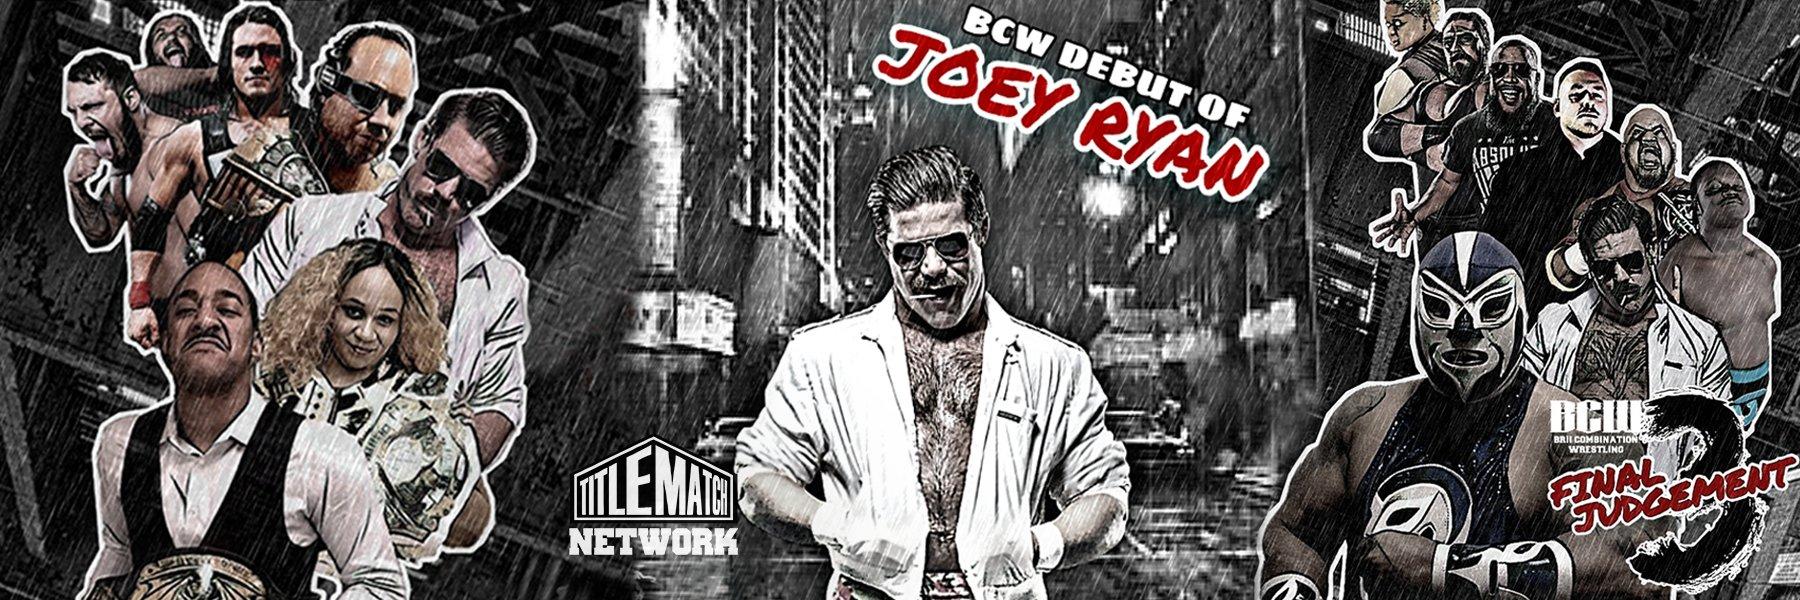 "BCW ""Final Judgment 3"" (Joey Ryan, Faye Jackson, Darius Carter, Vanity)"